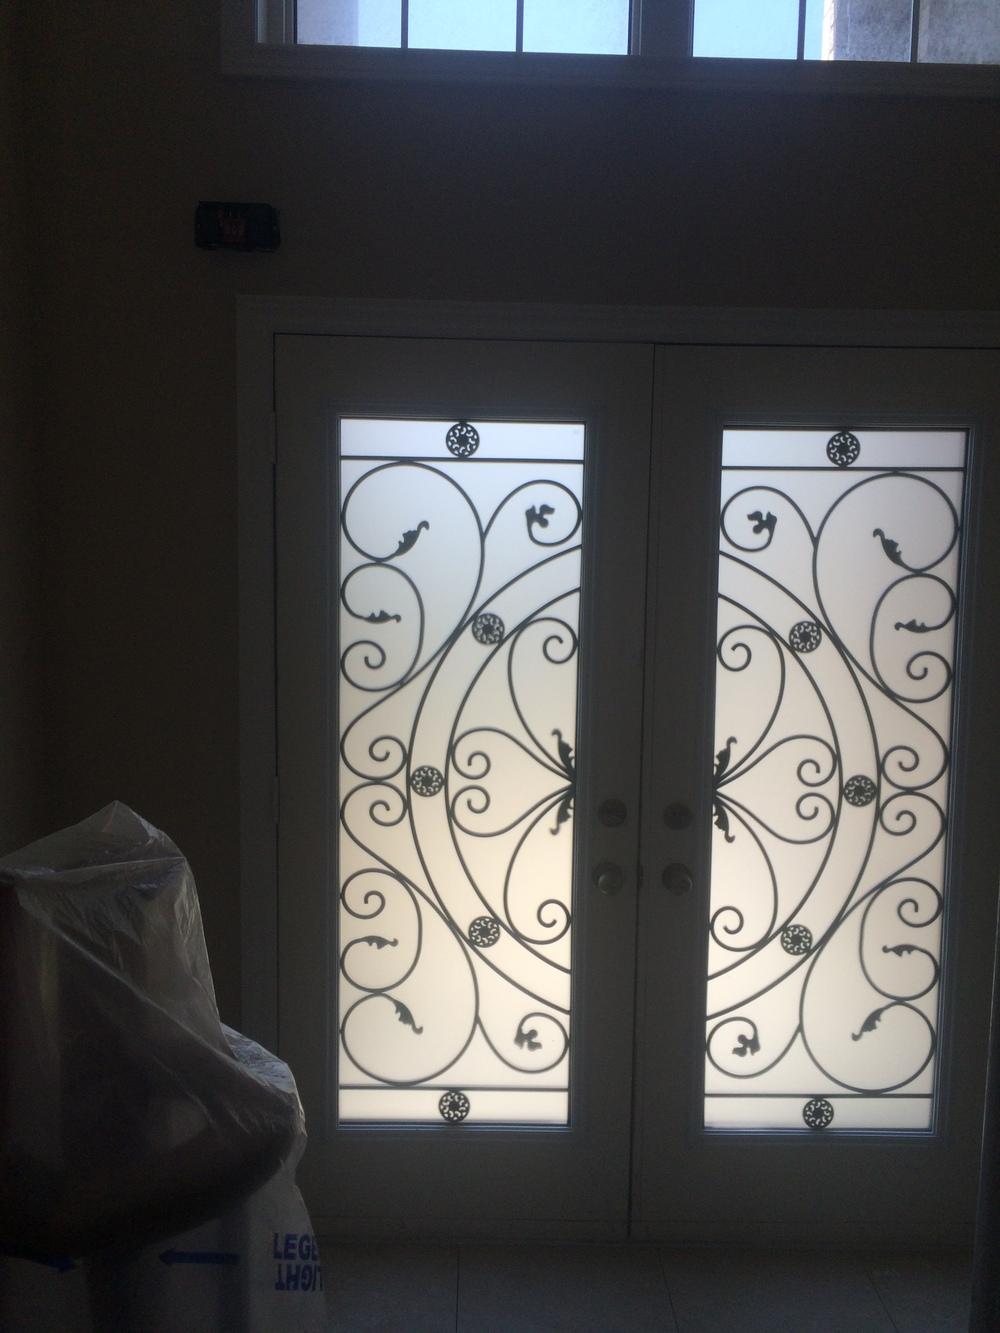 Campbellsford-Wrought-Iron-Glass-Door-Inserts-vaughan-Ontario